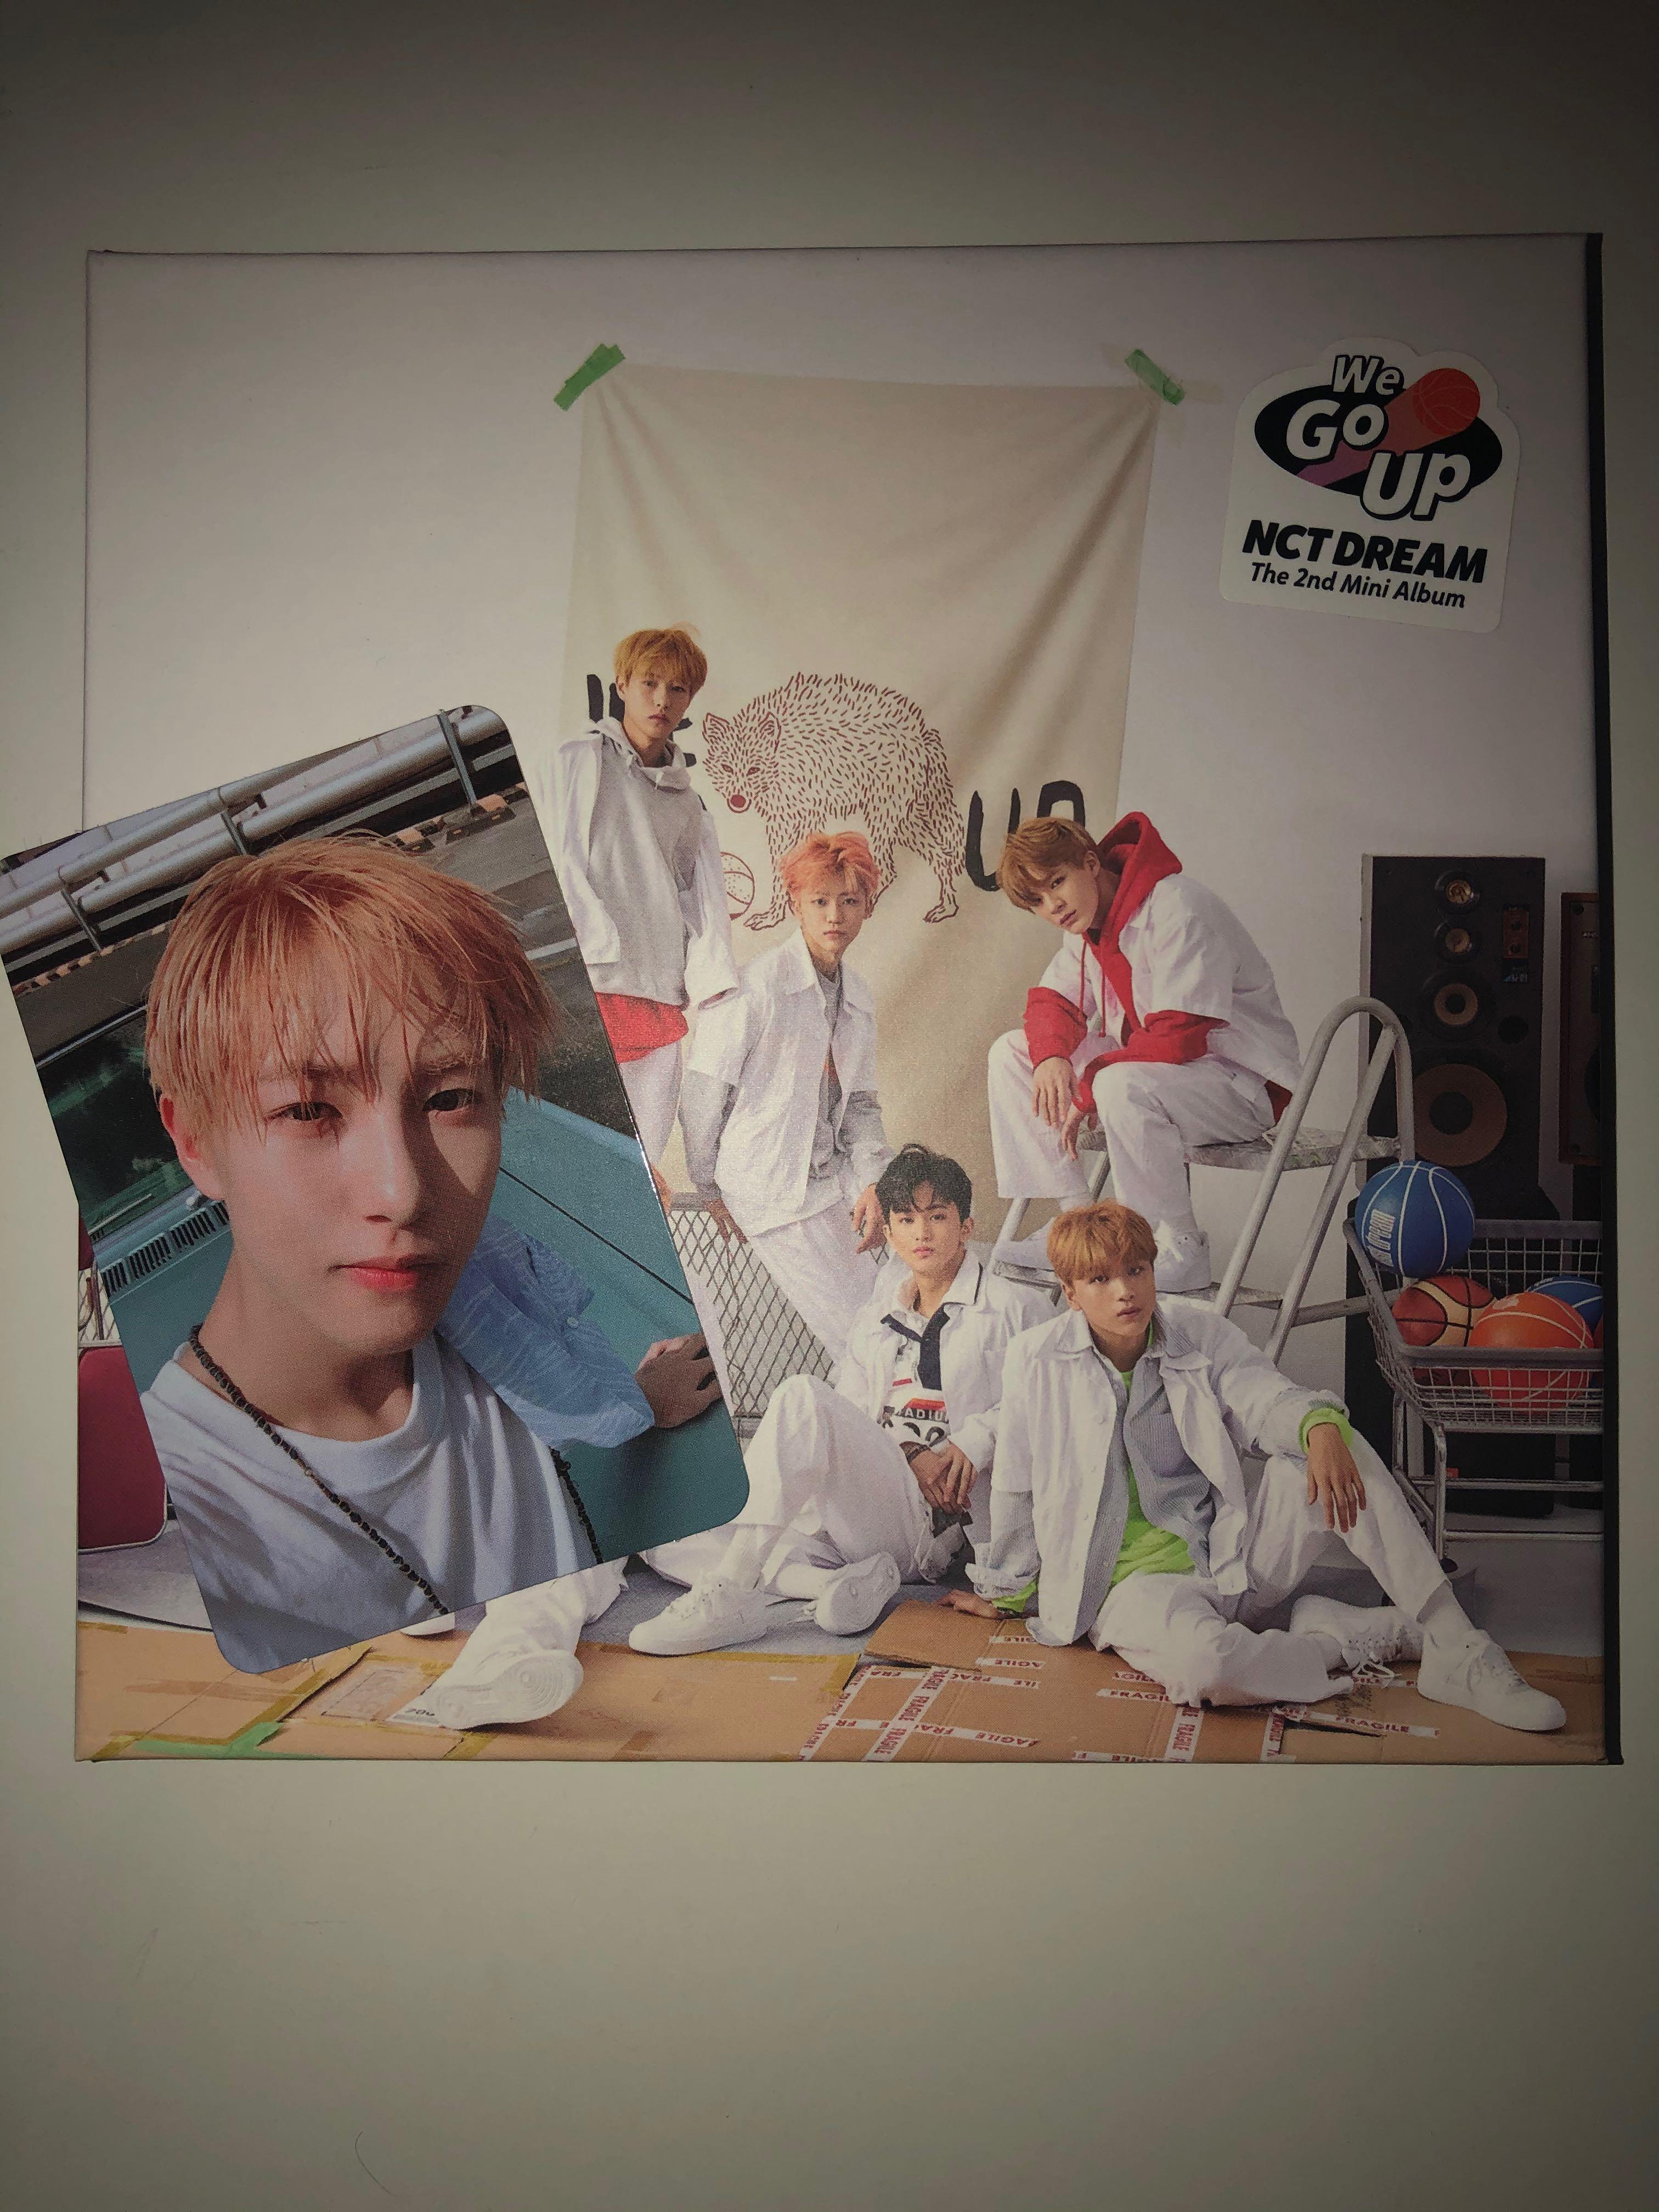 We Go Up- Nct Dream The 2nd Mini Album  (Full Set)